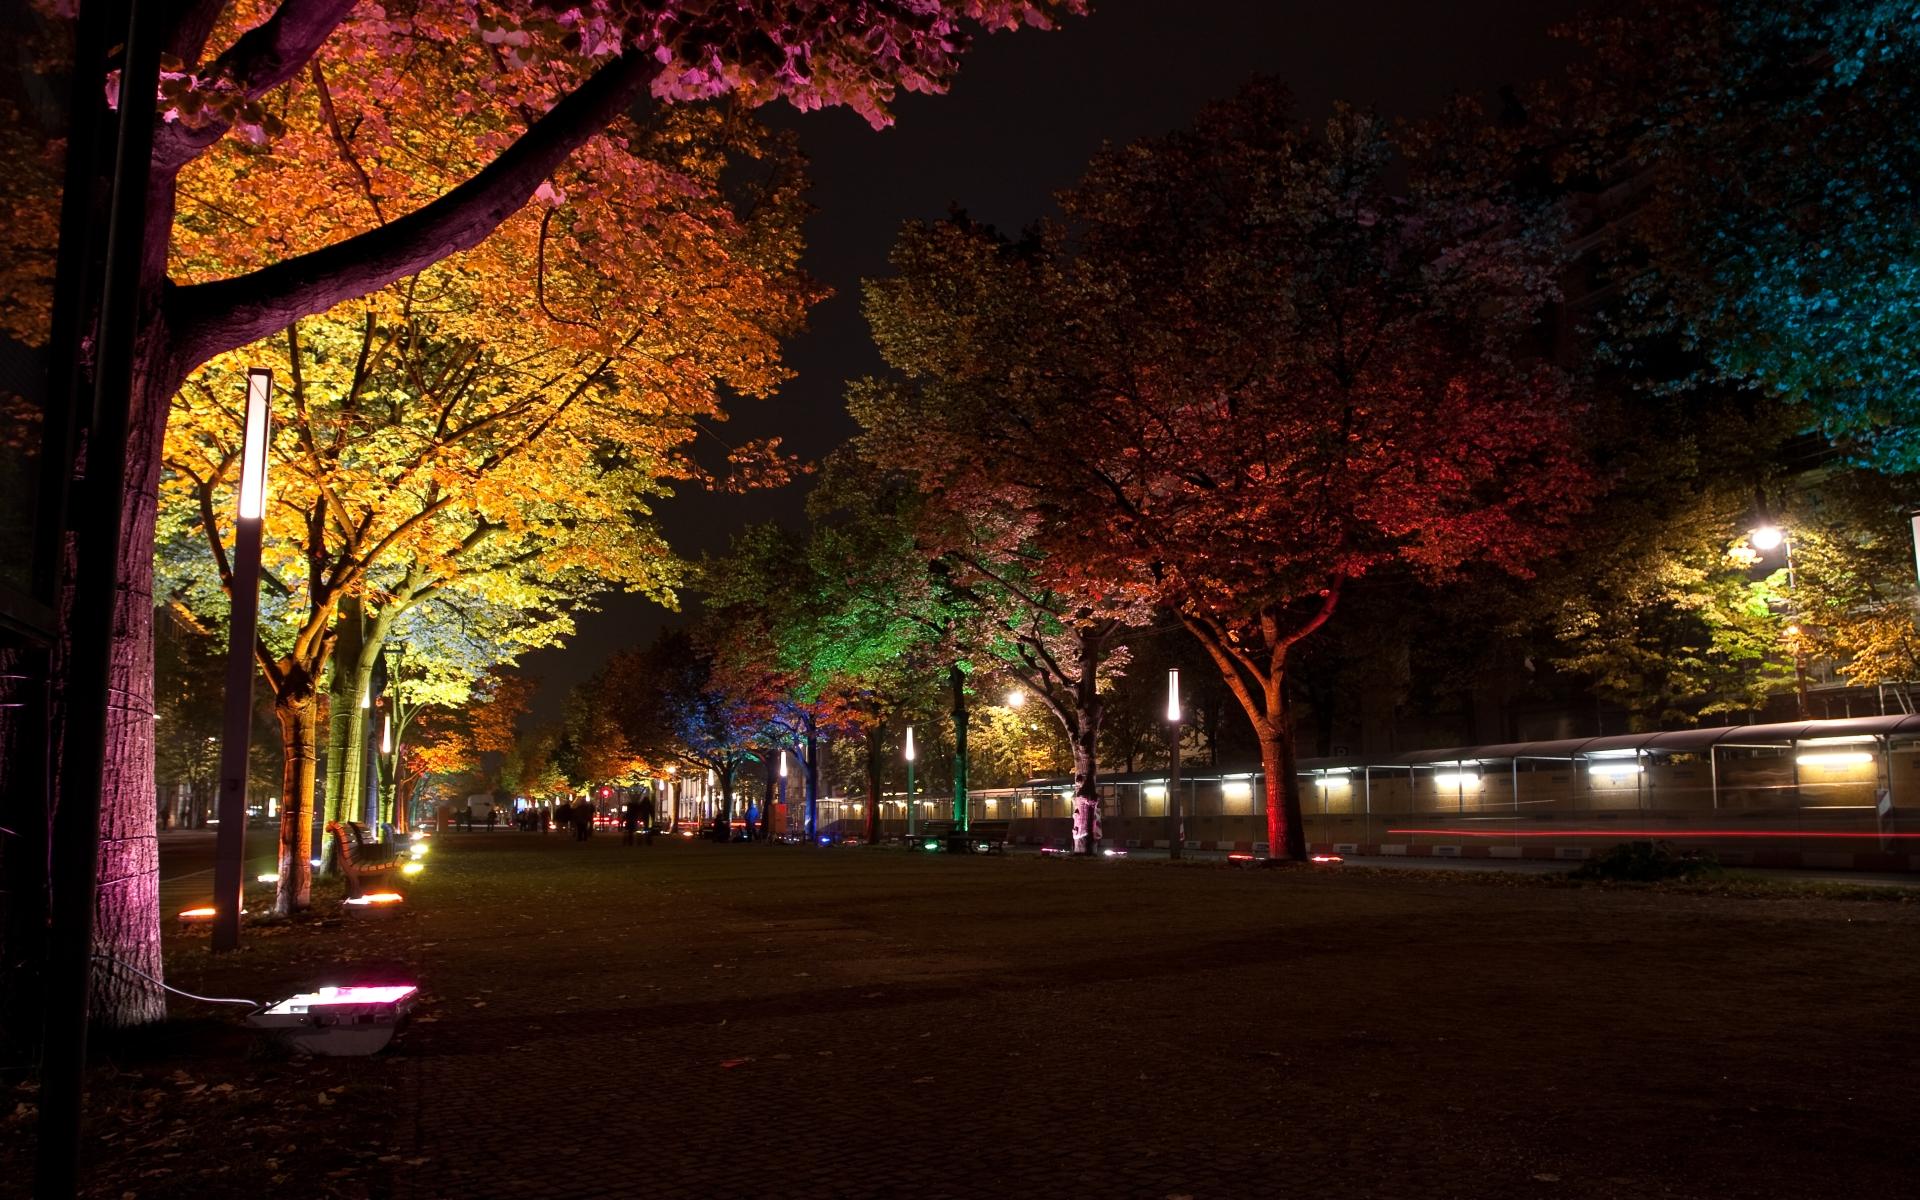 18 Festival Of Lights Berlin Hd Wallpapers Backgrounds